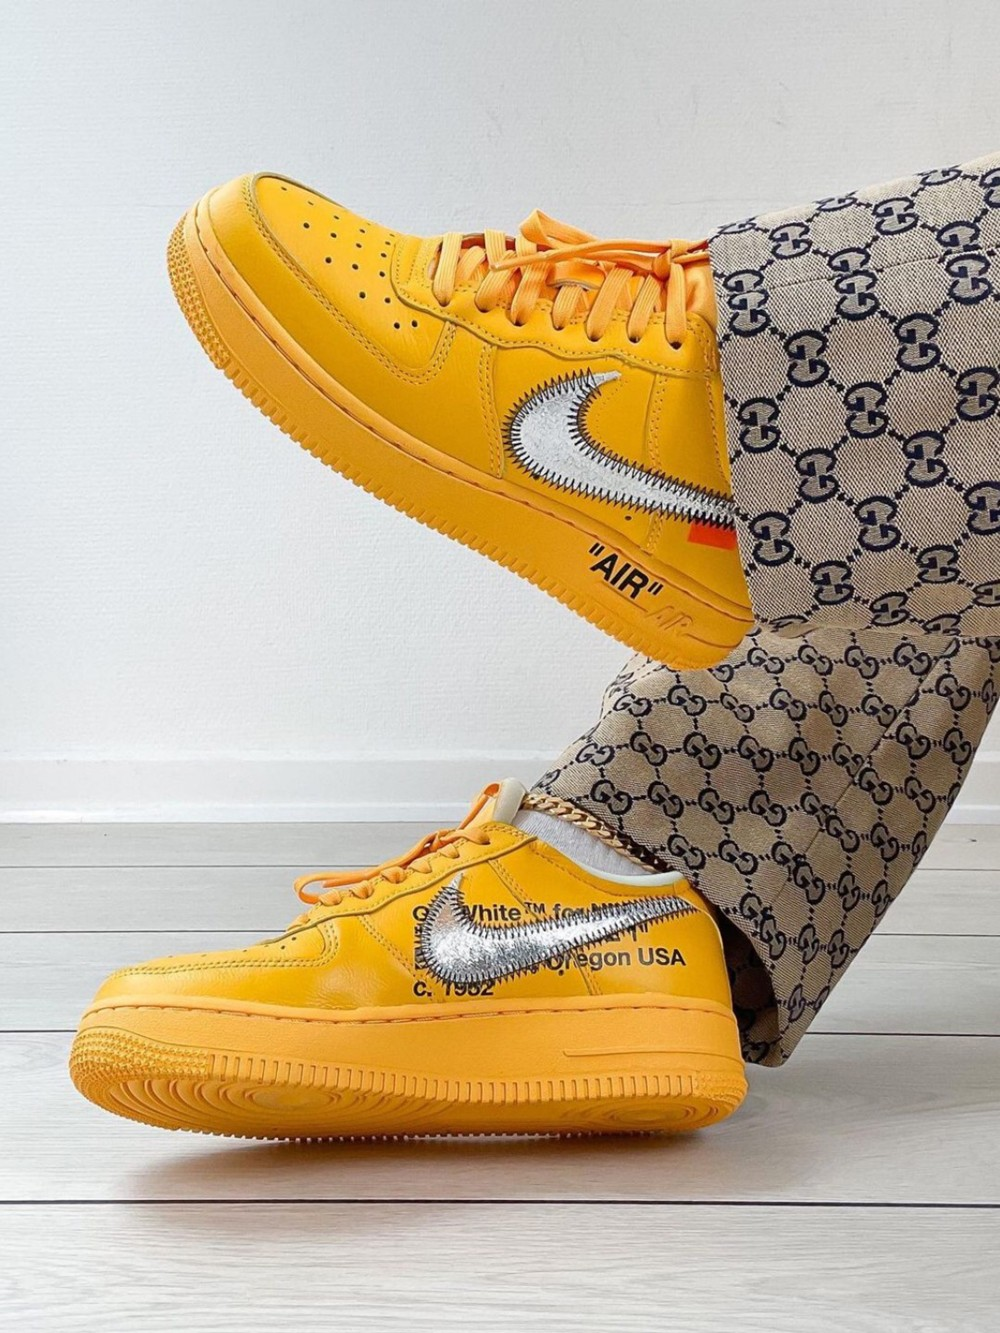 Nike,Air Jordan,New Balance  今年「天价鞋王」提前预定!「闪电反勾」勉强前三!最贵的能买它三双!